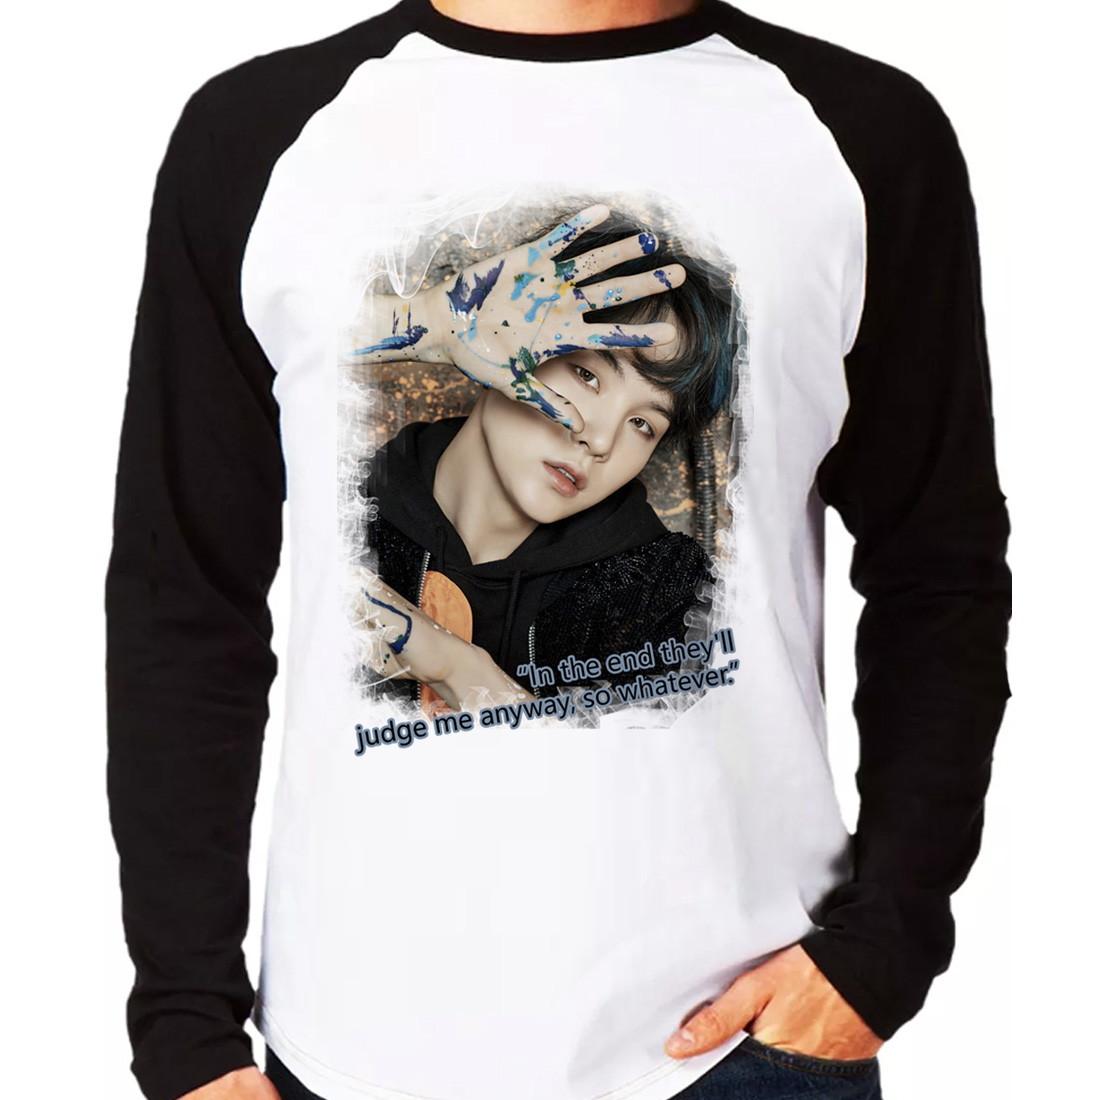 8d5412e282d53 Camiseta BTS Bangtan Boys Suga Walk Alone Raglan Manga Longa no Elo7 ...